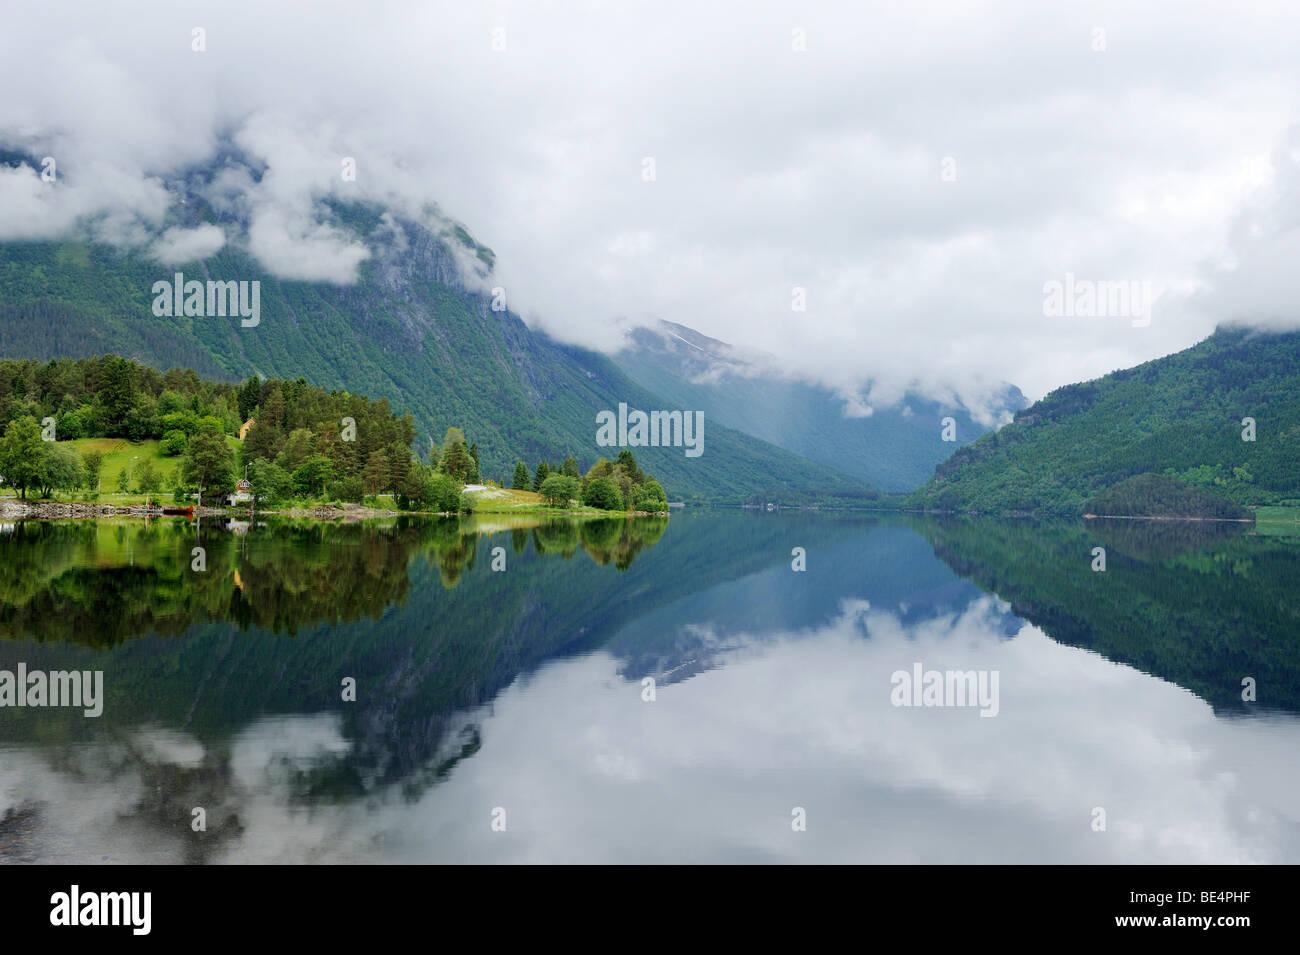 Bjorkedalsvatnet lake with reflection near Volda, Norway, Scandinavia, Europe - Stock Image